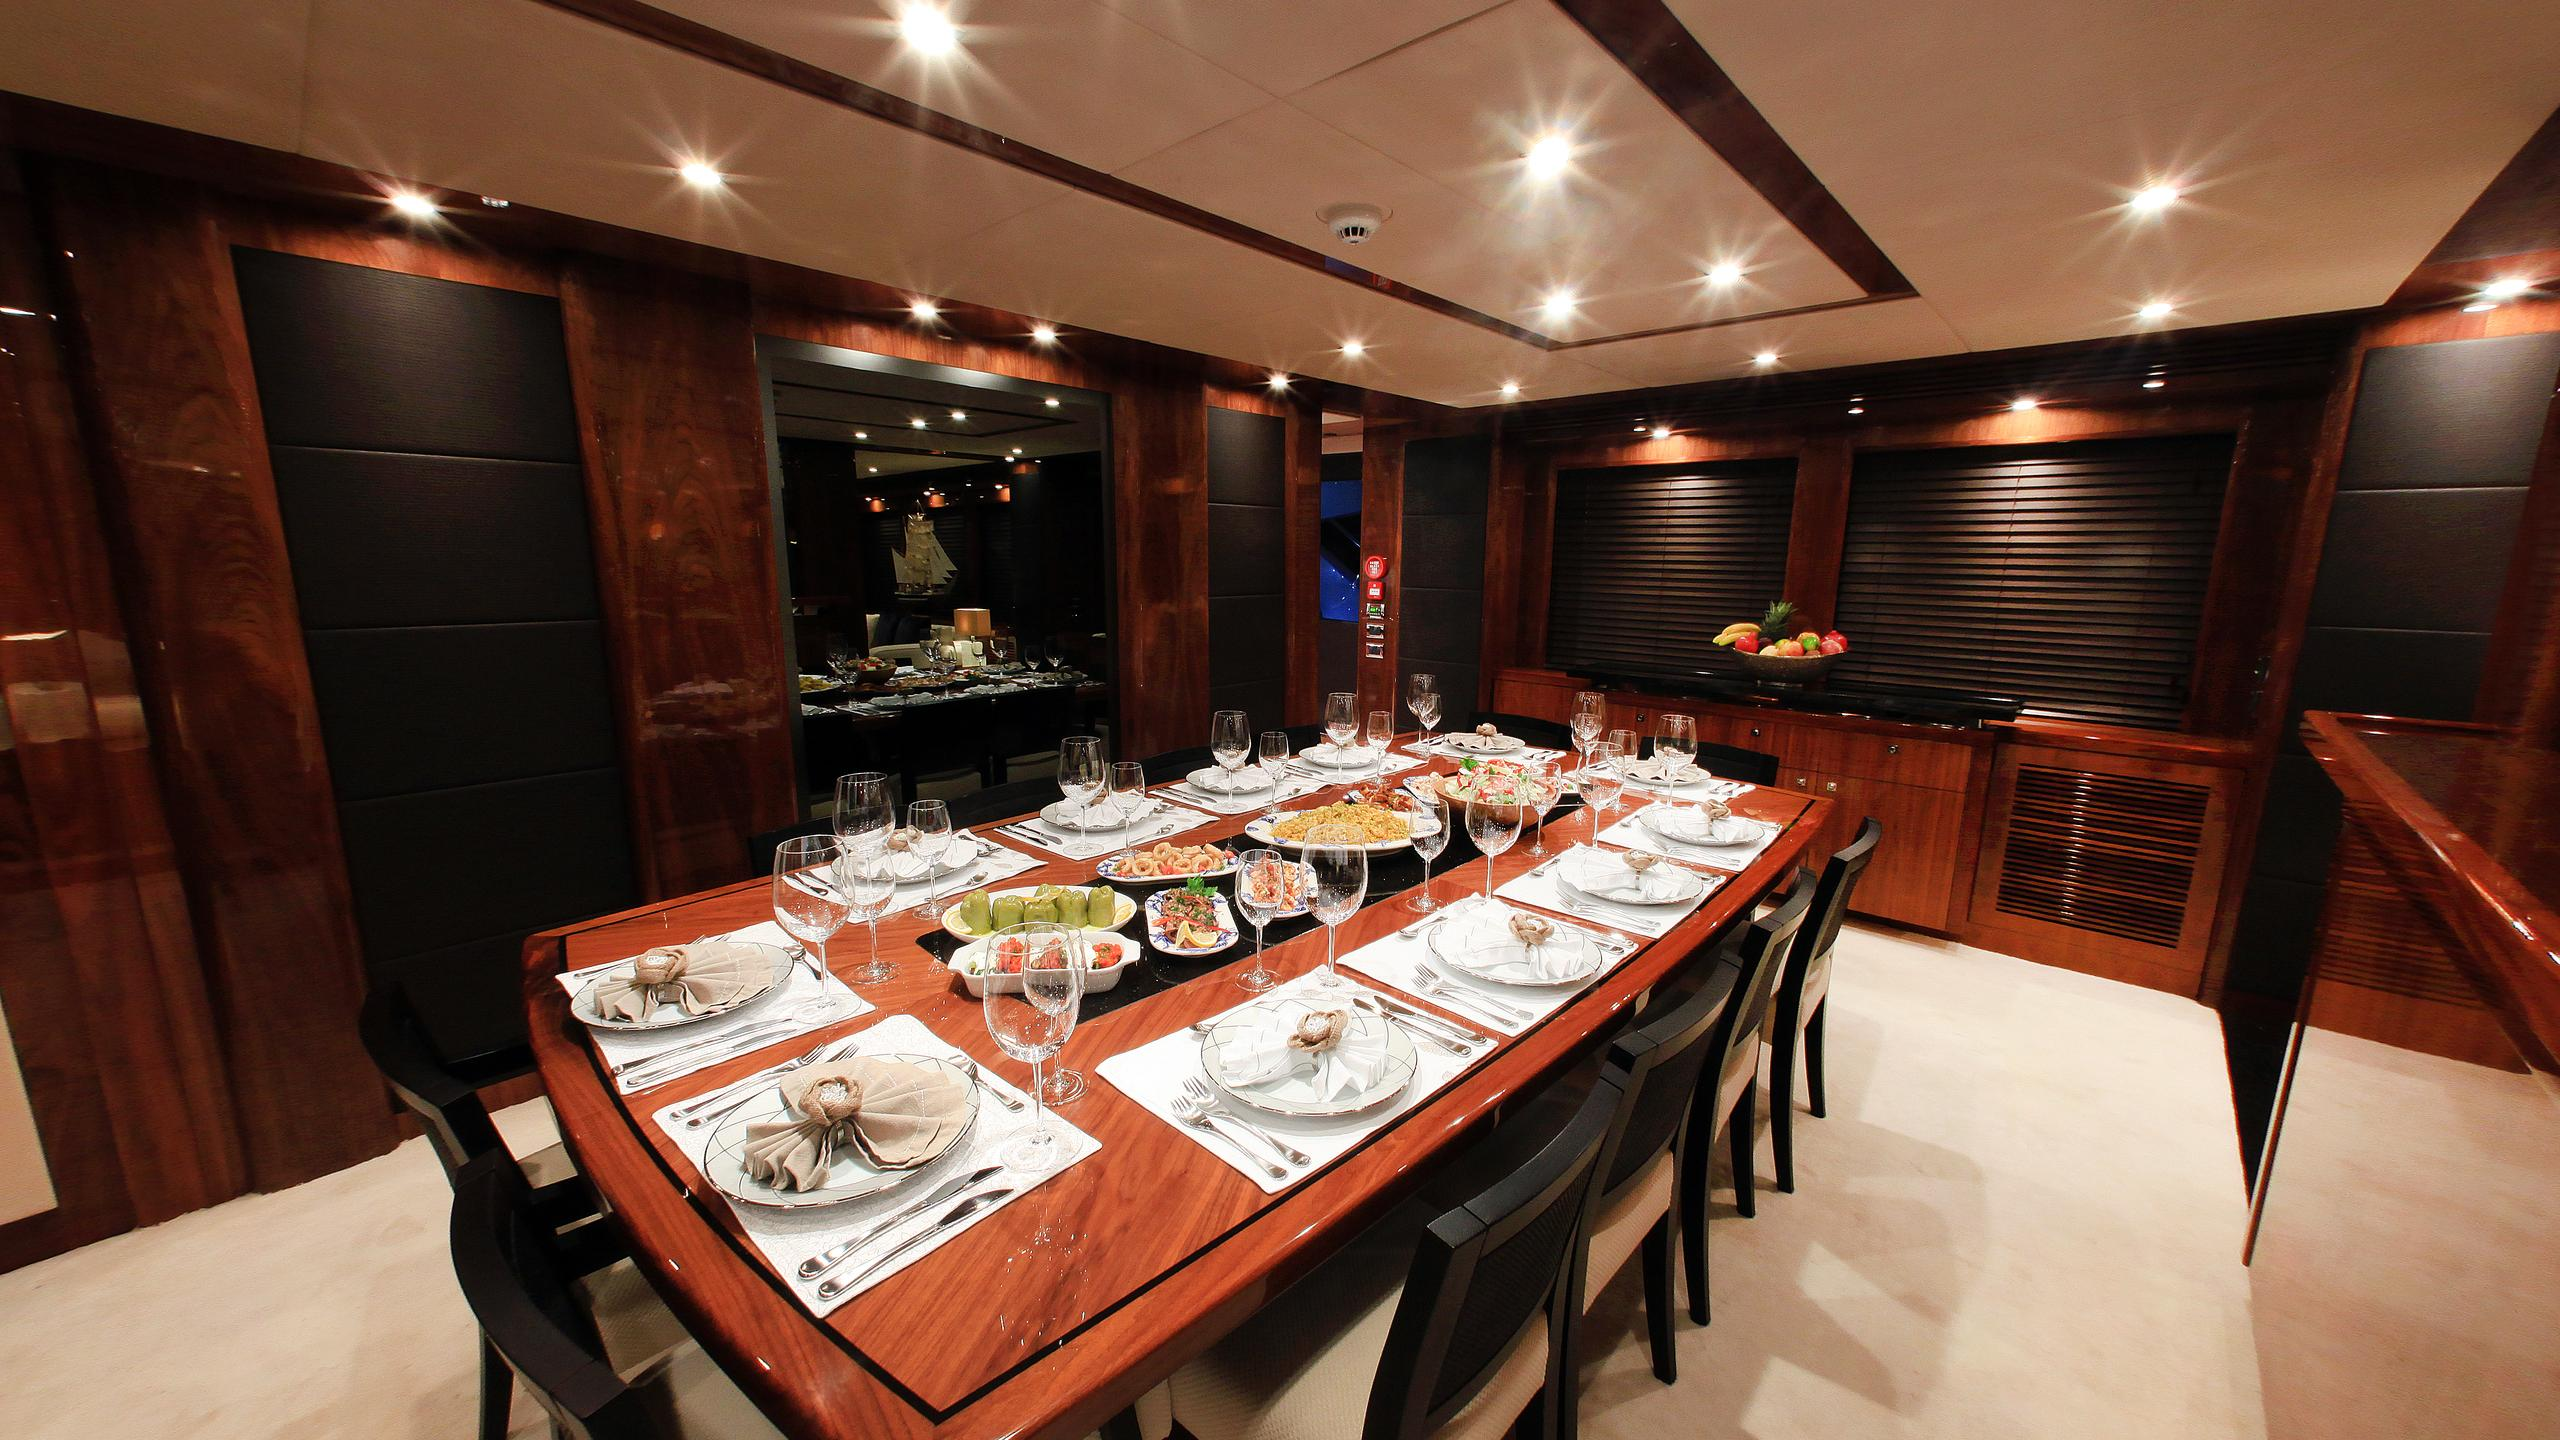 barracuda-red-sea-yacht-formal-dining